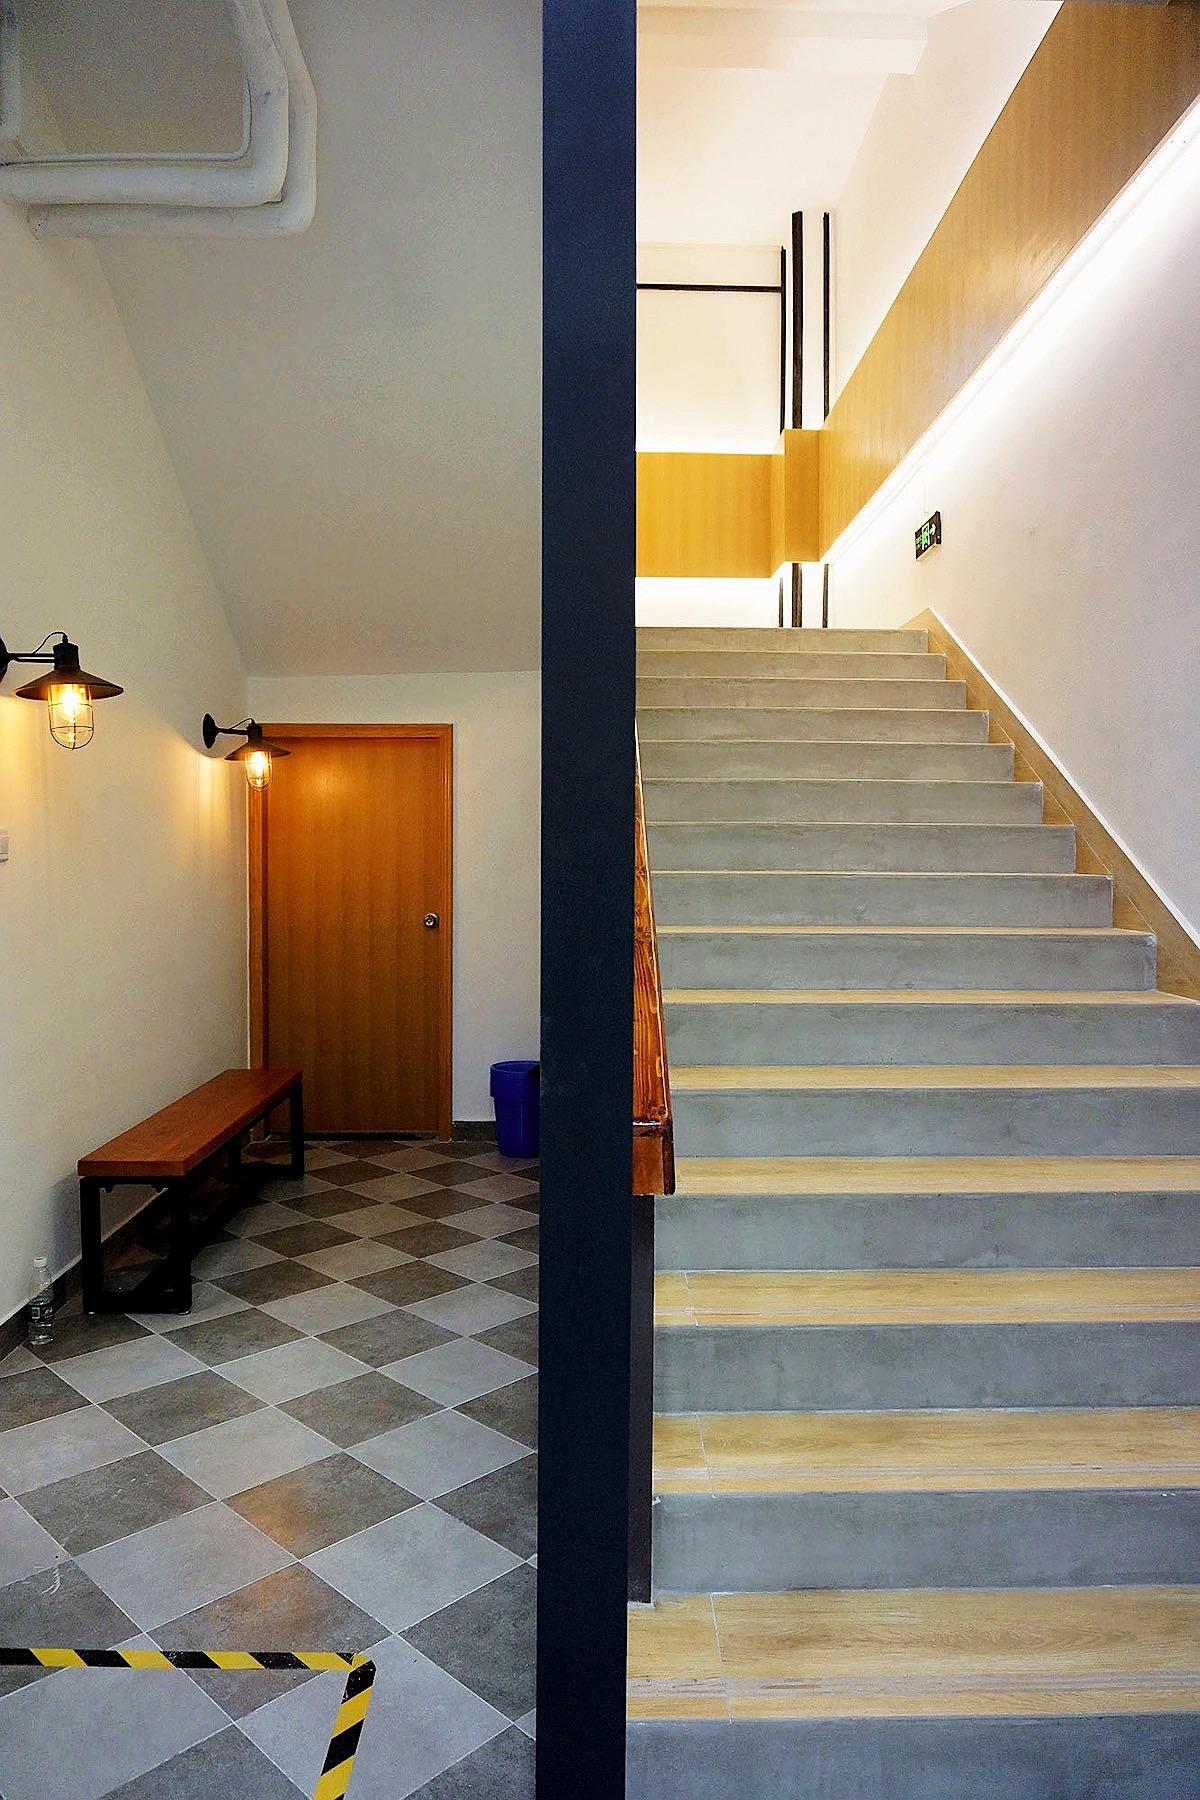 Grandway Office Renovation 2018 2nd Floor Boss Room Corridor 007